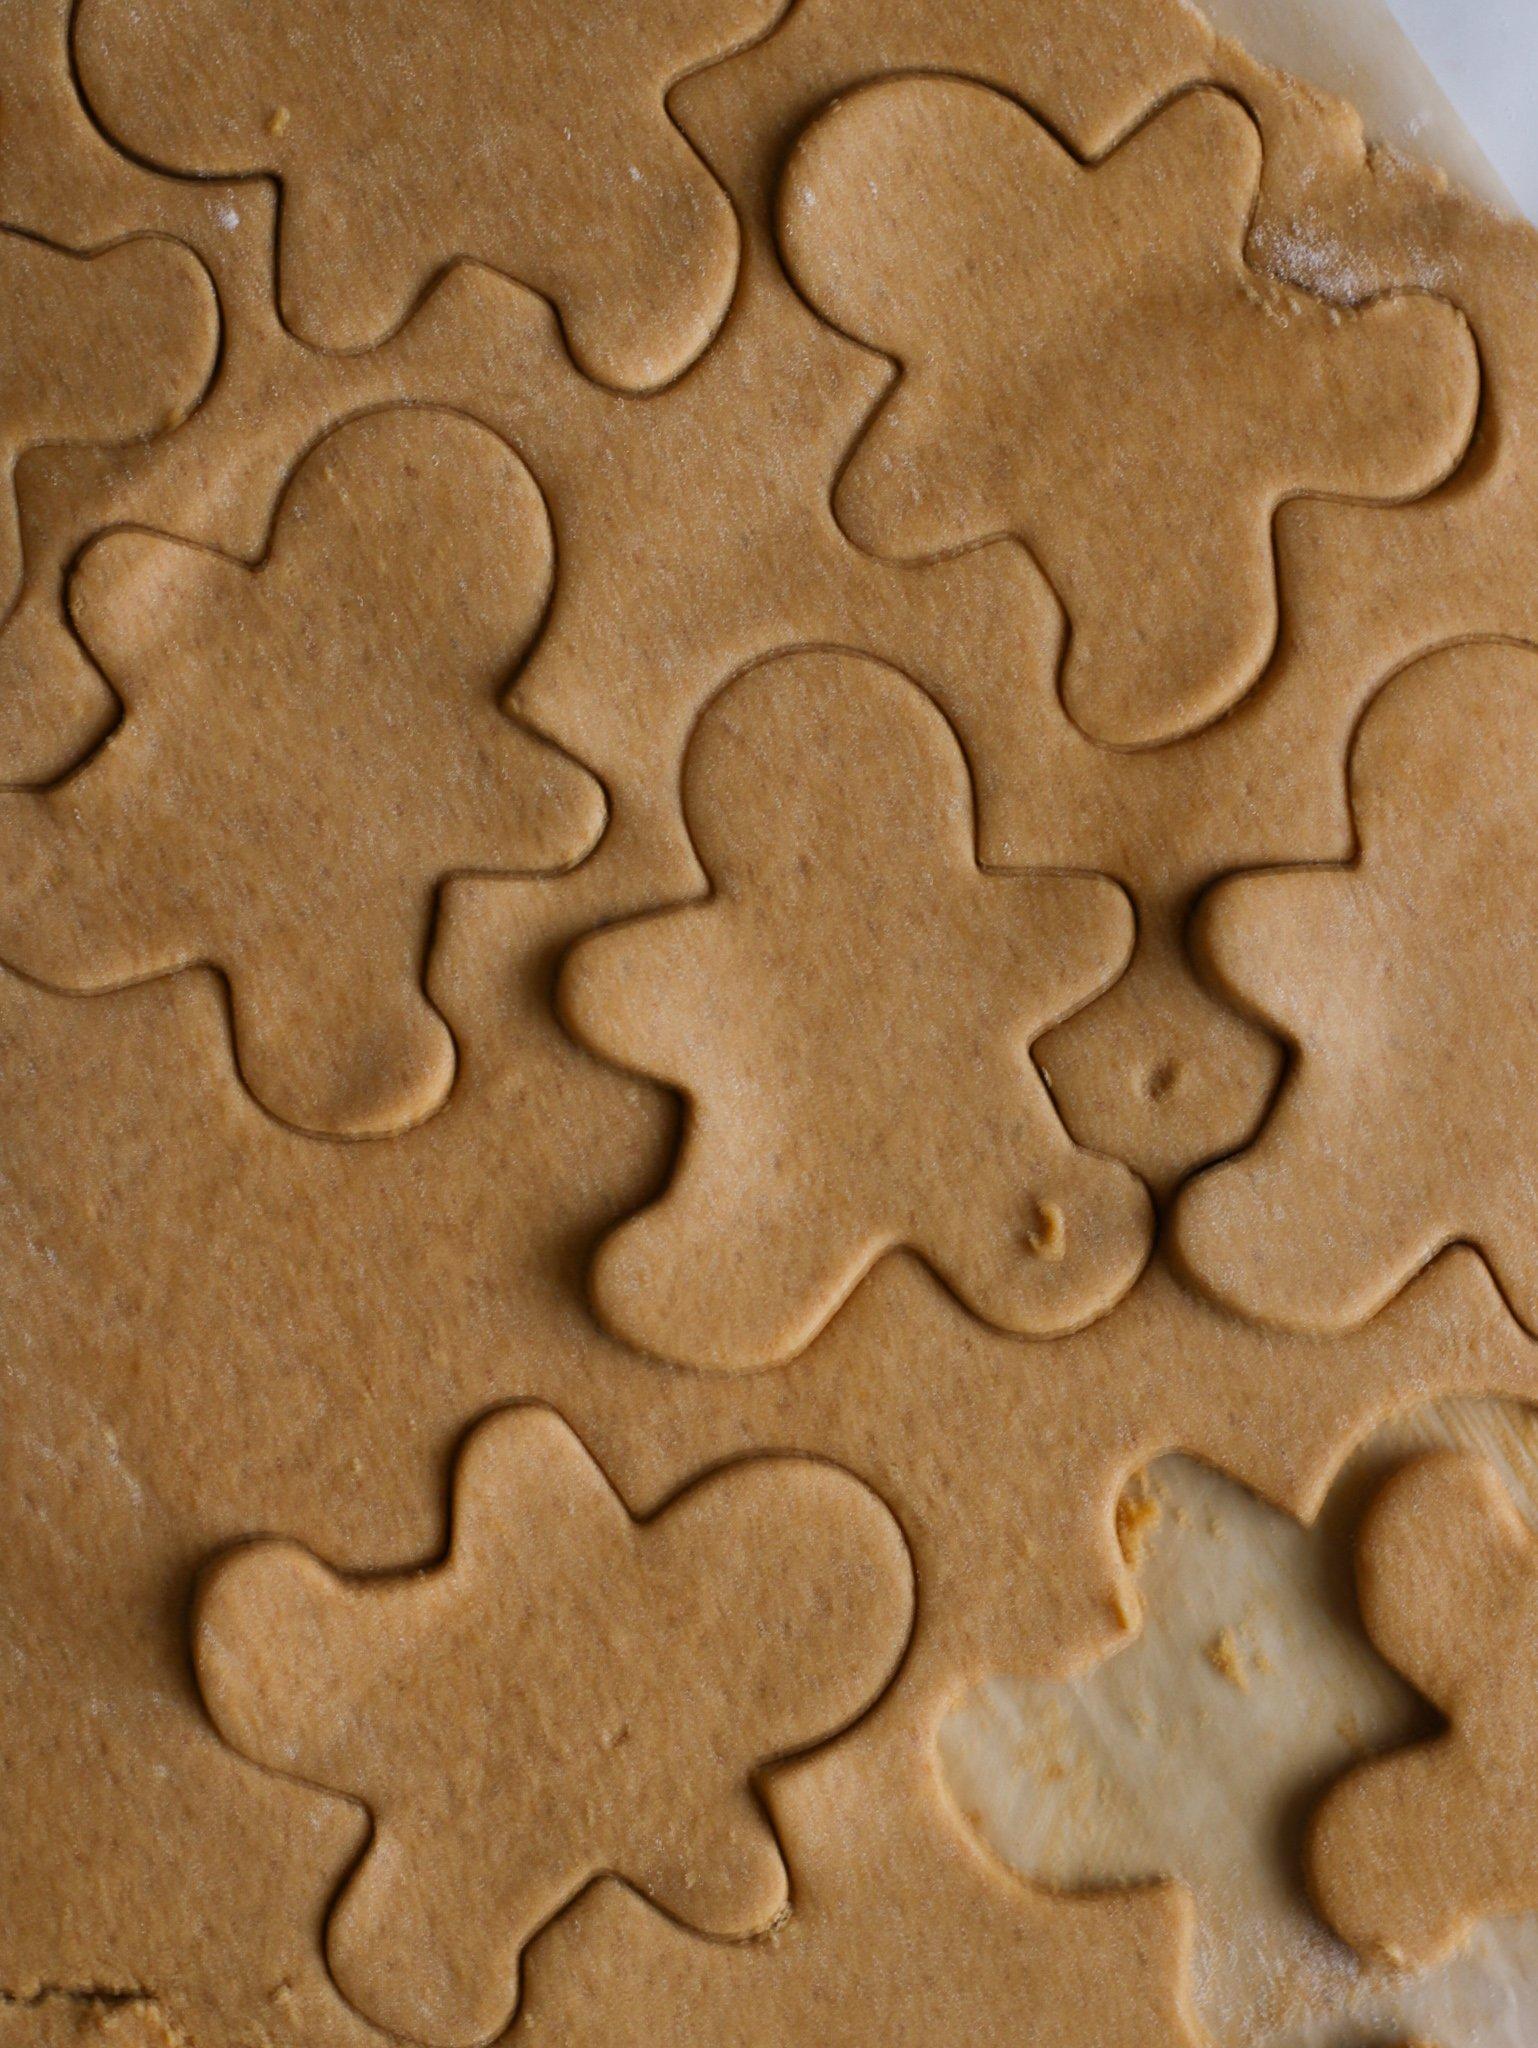 raw gluten free gingerbread cookie dough being cut into little gingerbread men